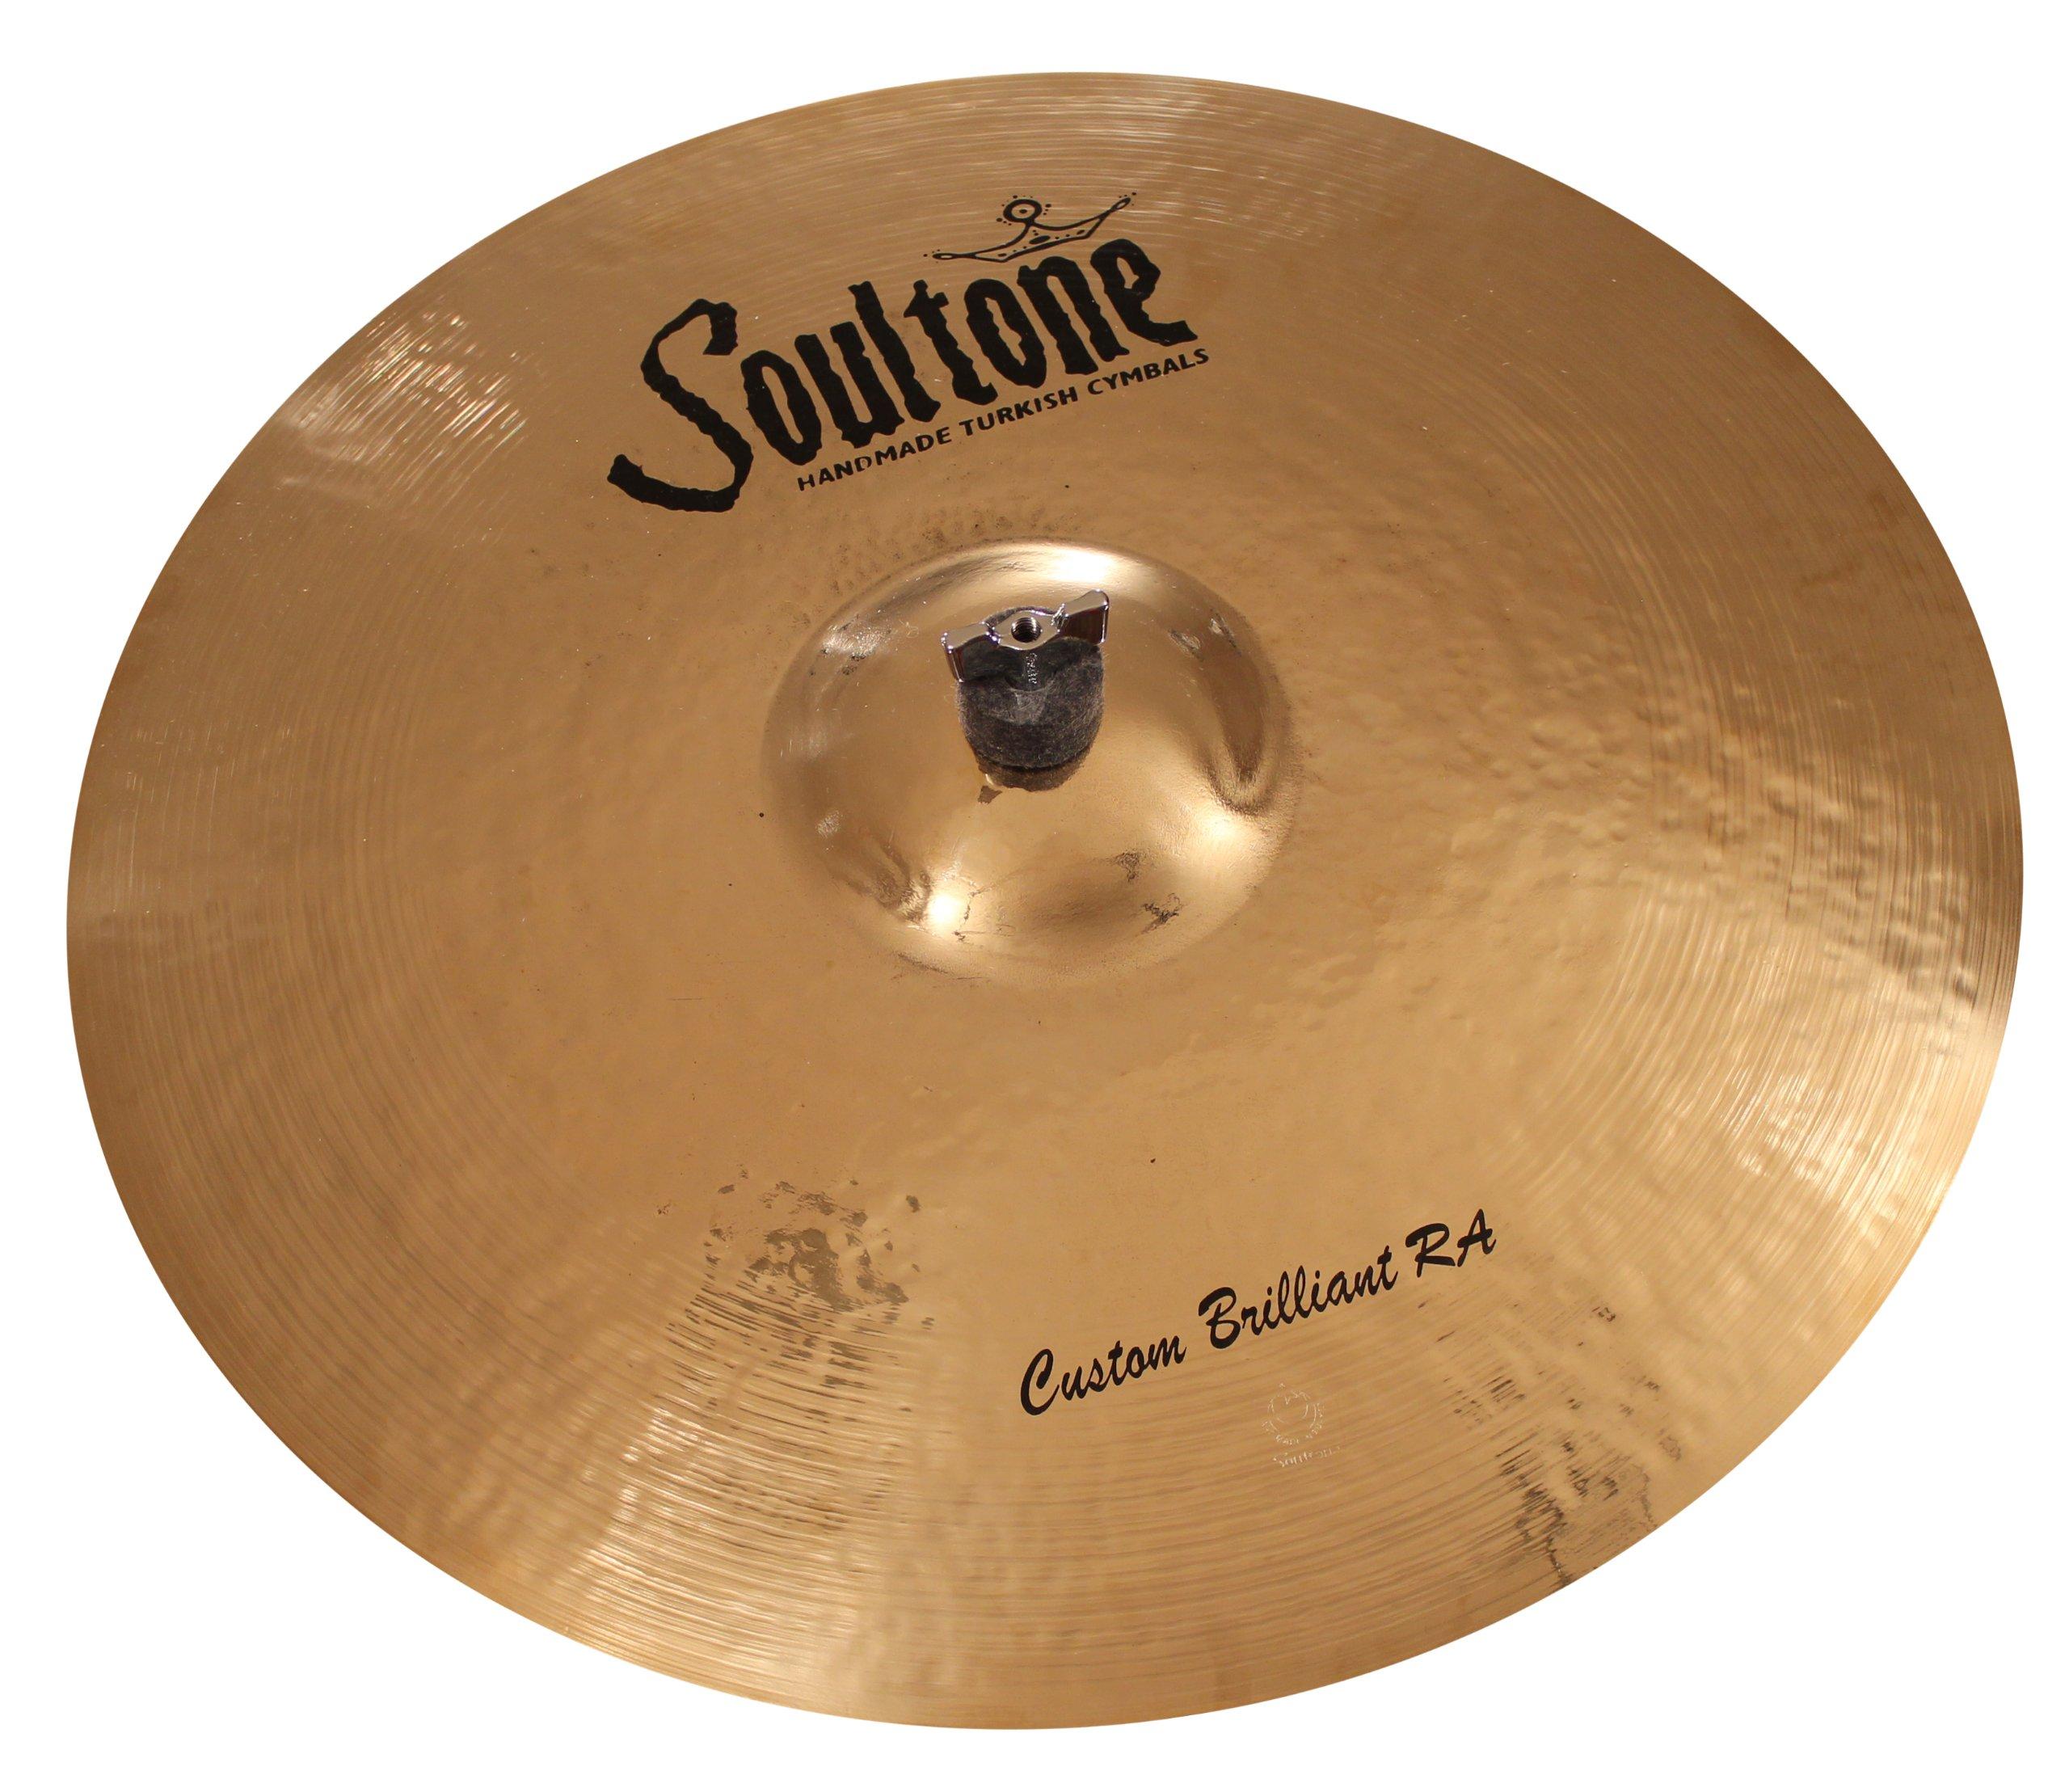 Soultone Cymbals CBRRA-RID24-24'' Custom Brilliant RA Ride by Soultone Cymbals